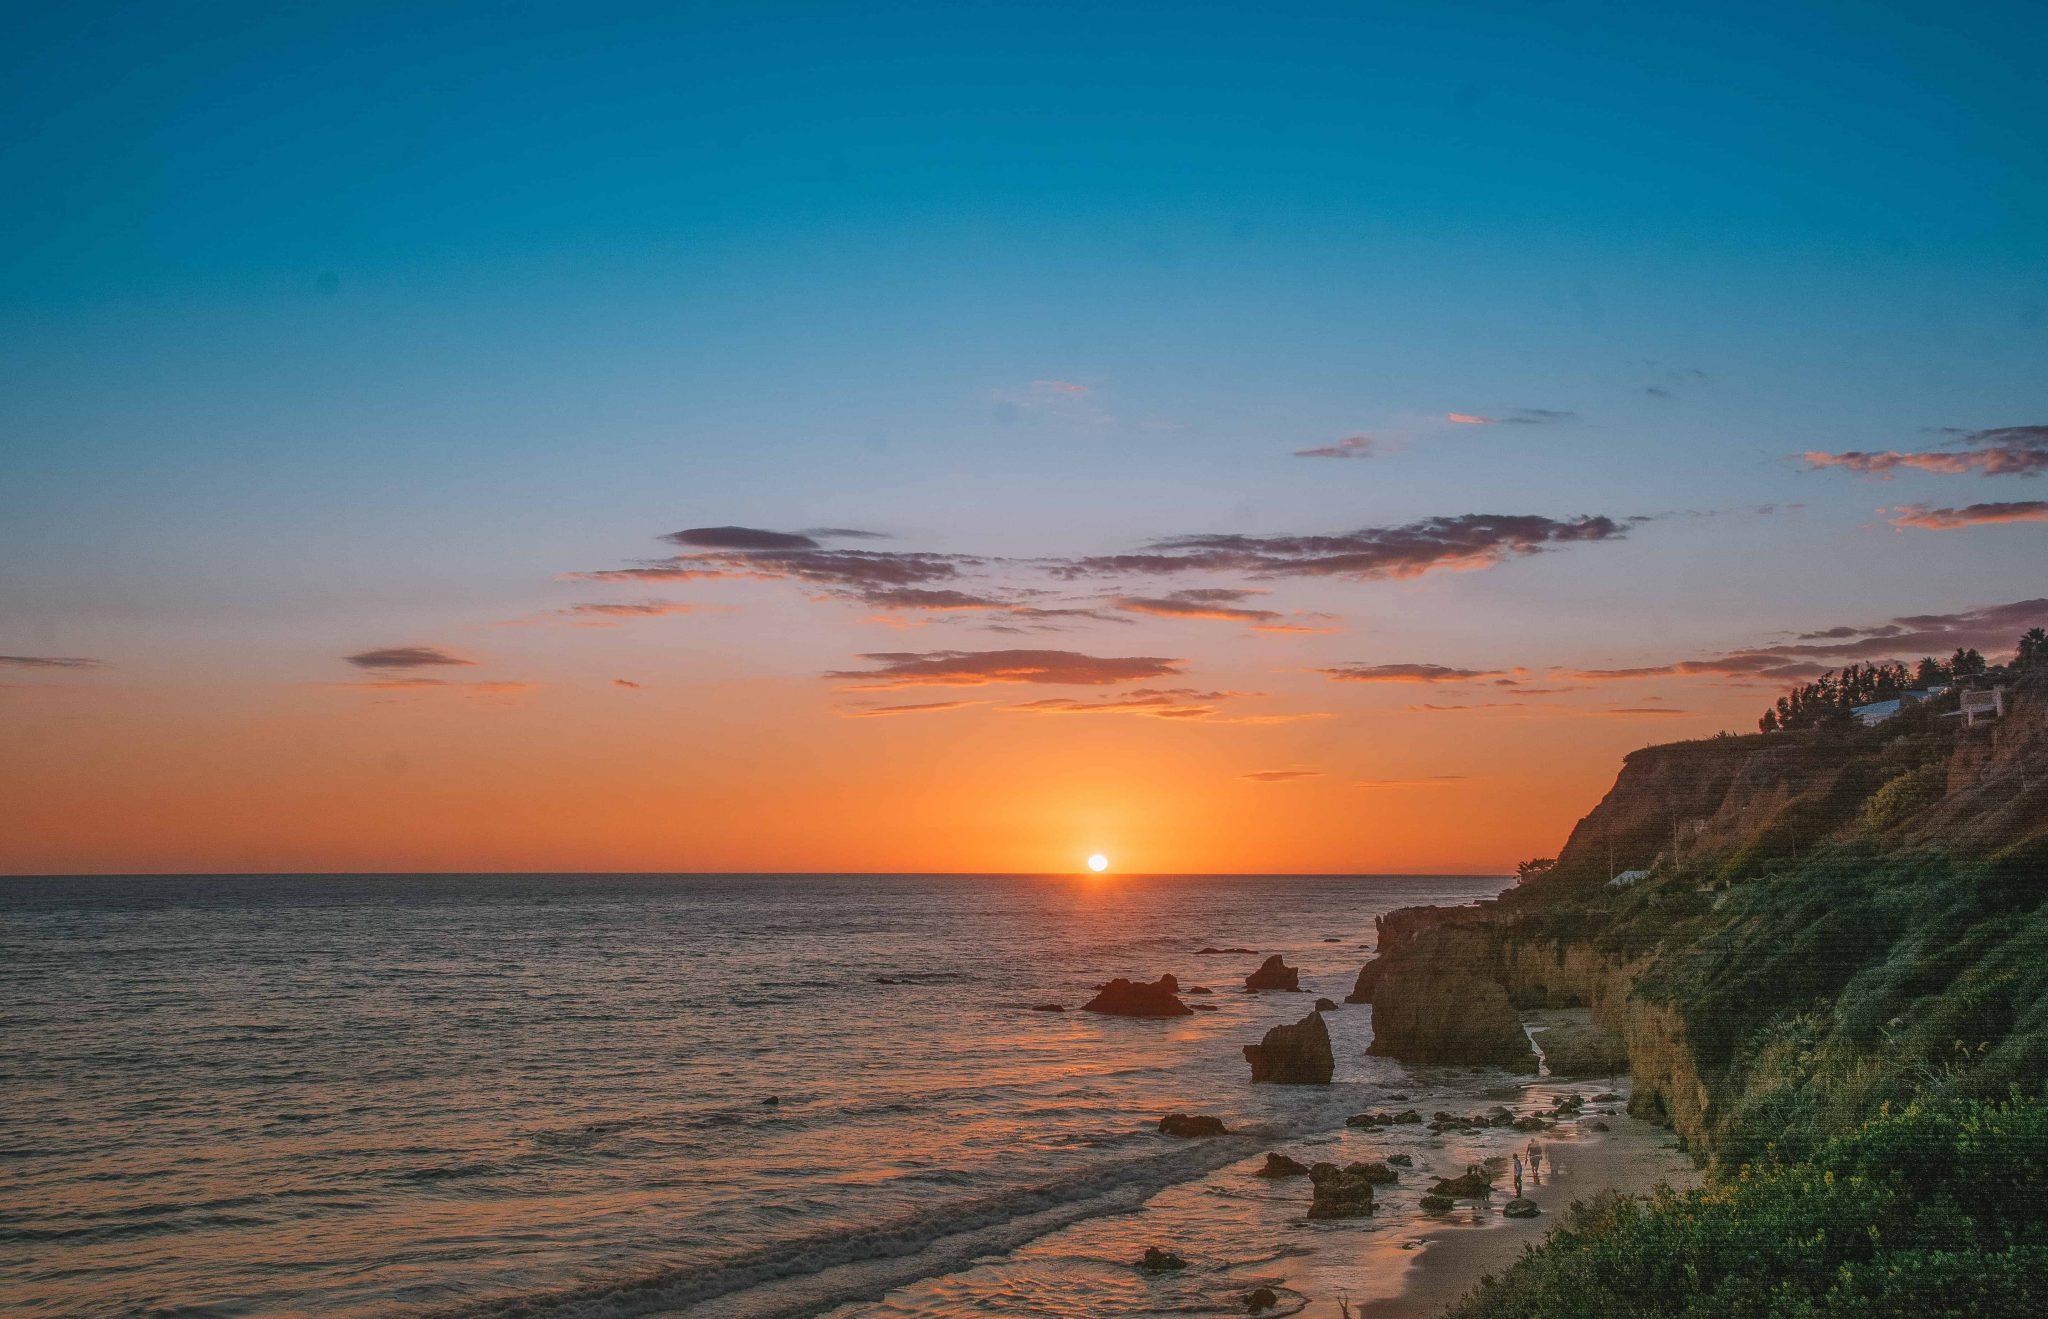 el matador beach - best place to watch the sunset in malibu